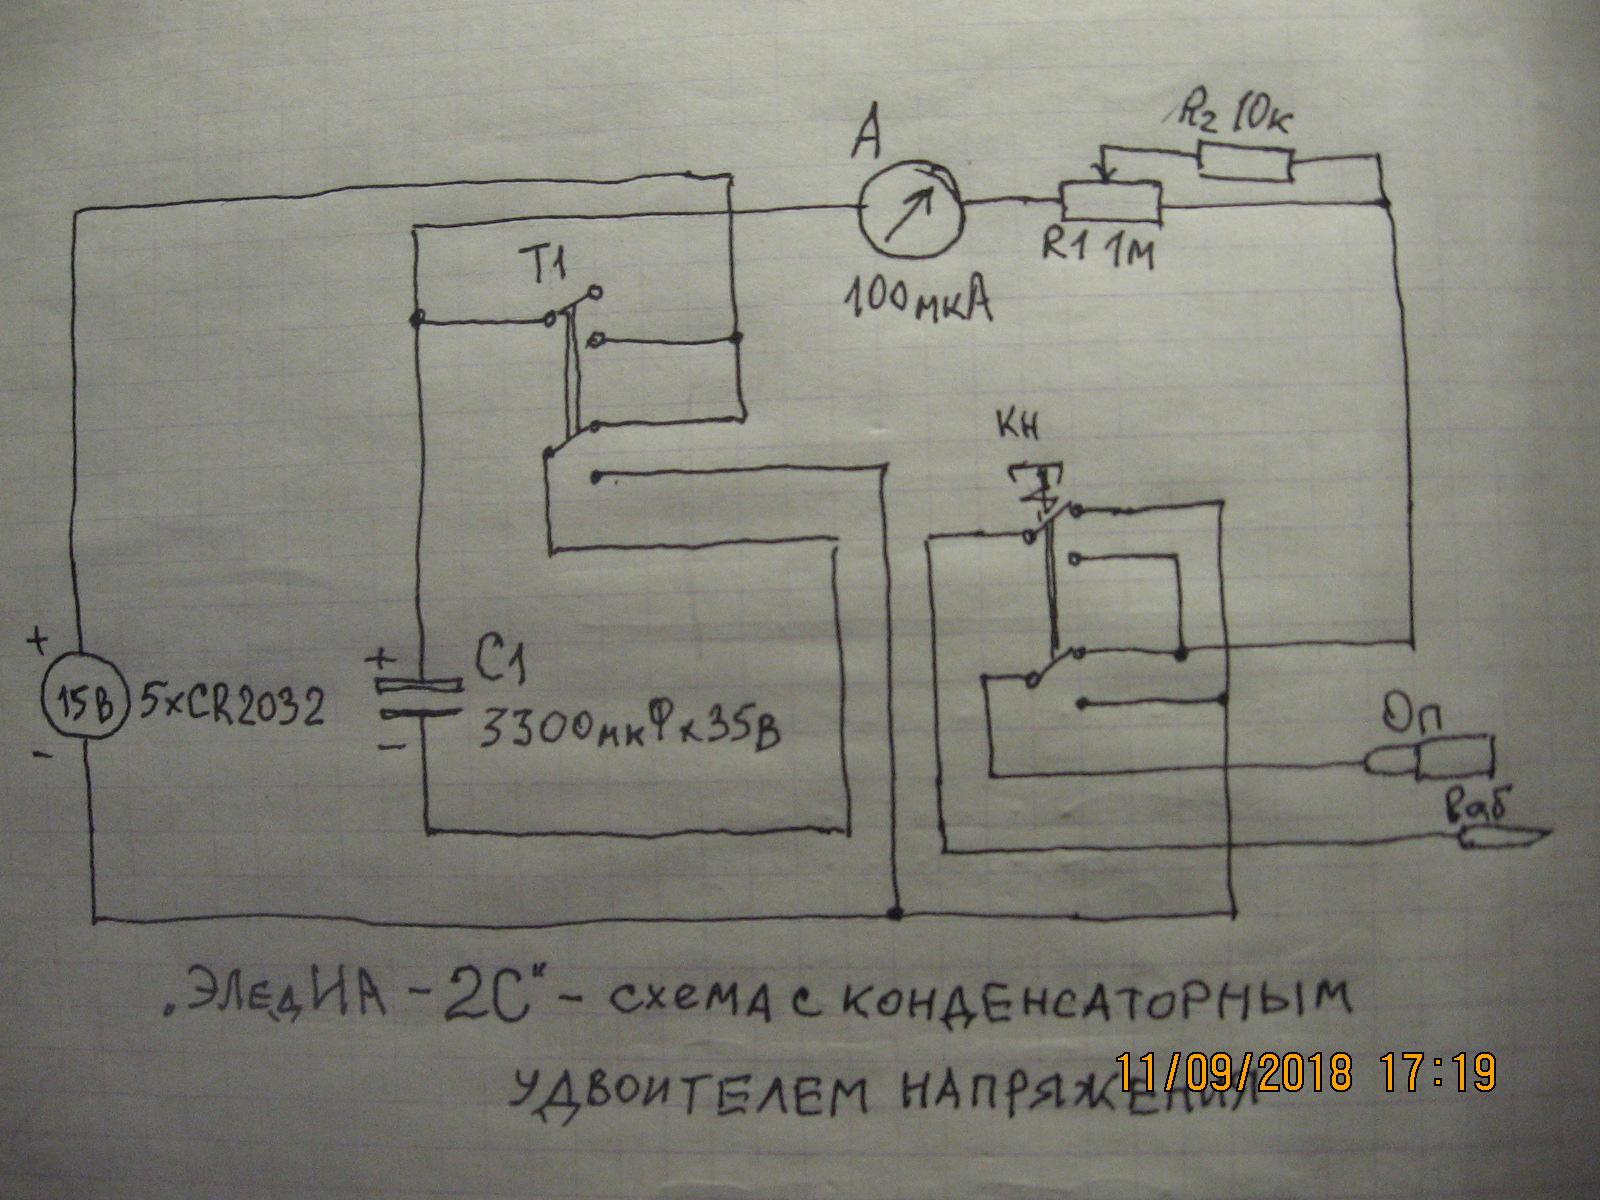 https://i6.imageban.ru/out/2018/09/11/9a7c66dbe2b7408185904665be7c2c5b.jpg